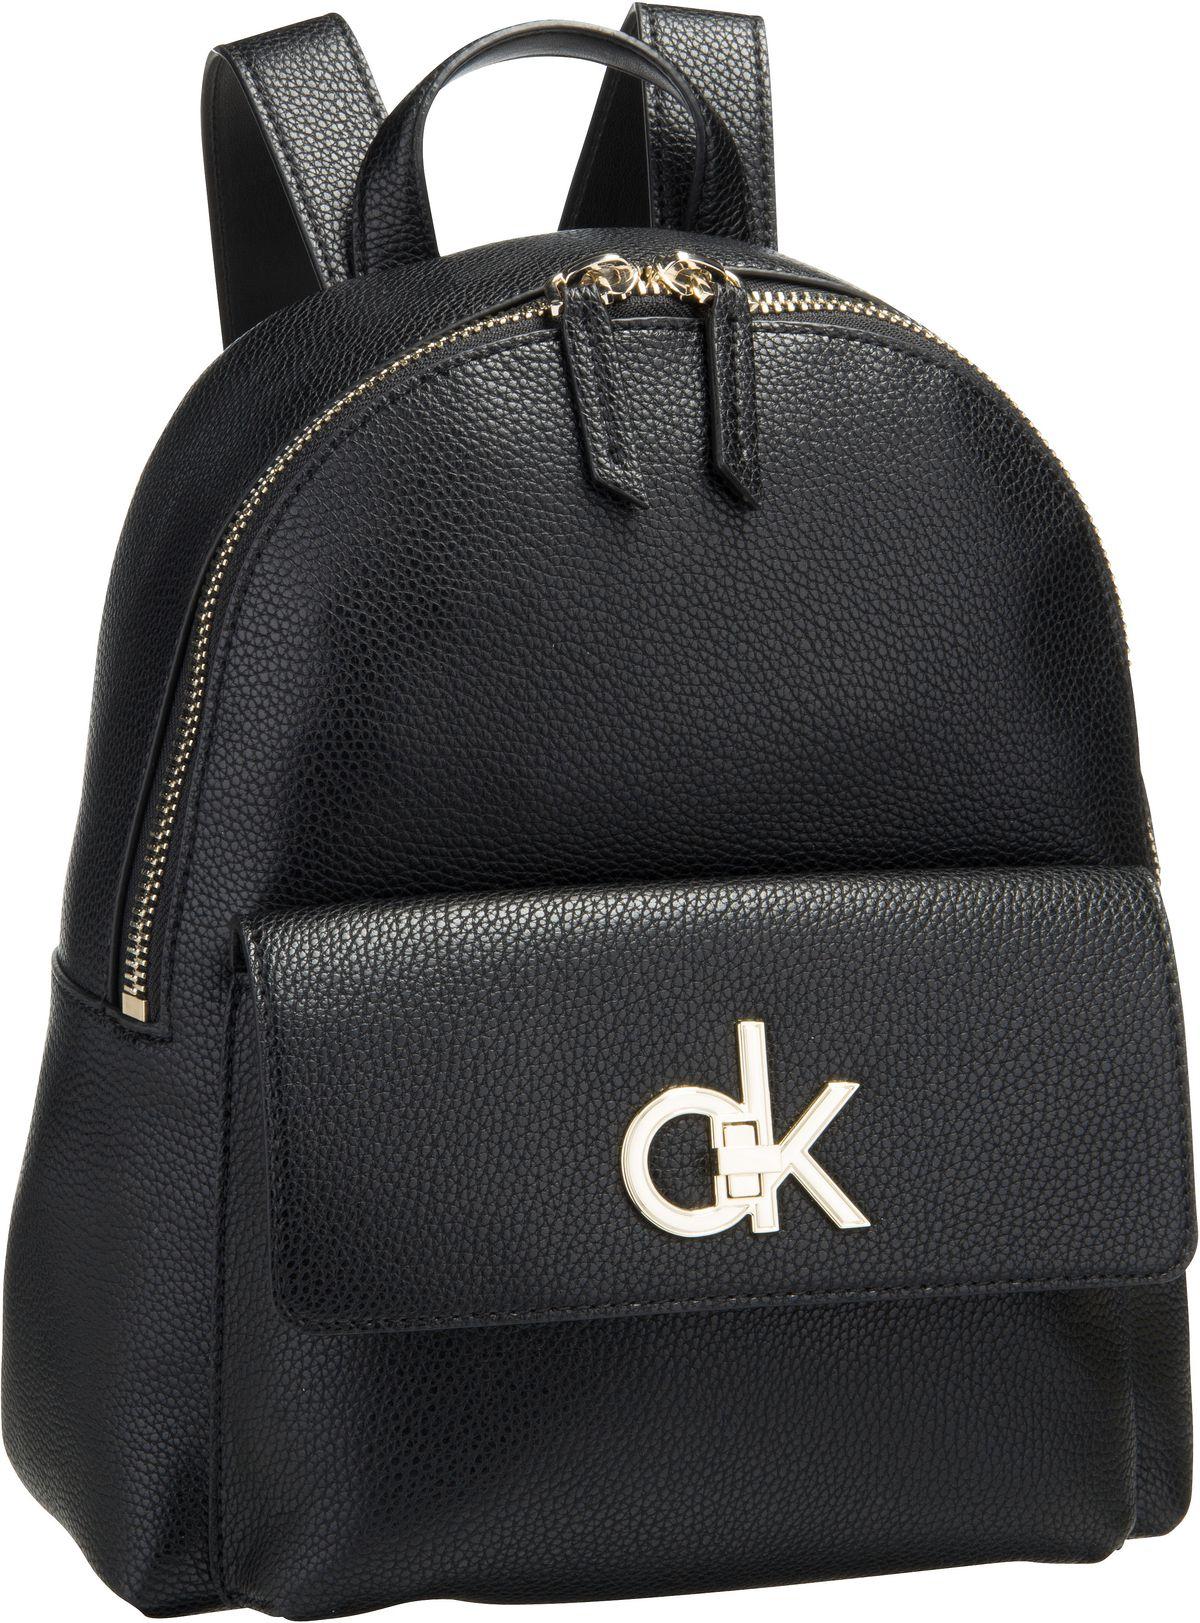 Rucksack / Daypack Re-Lock Backpack Black